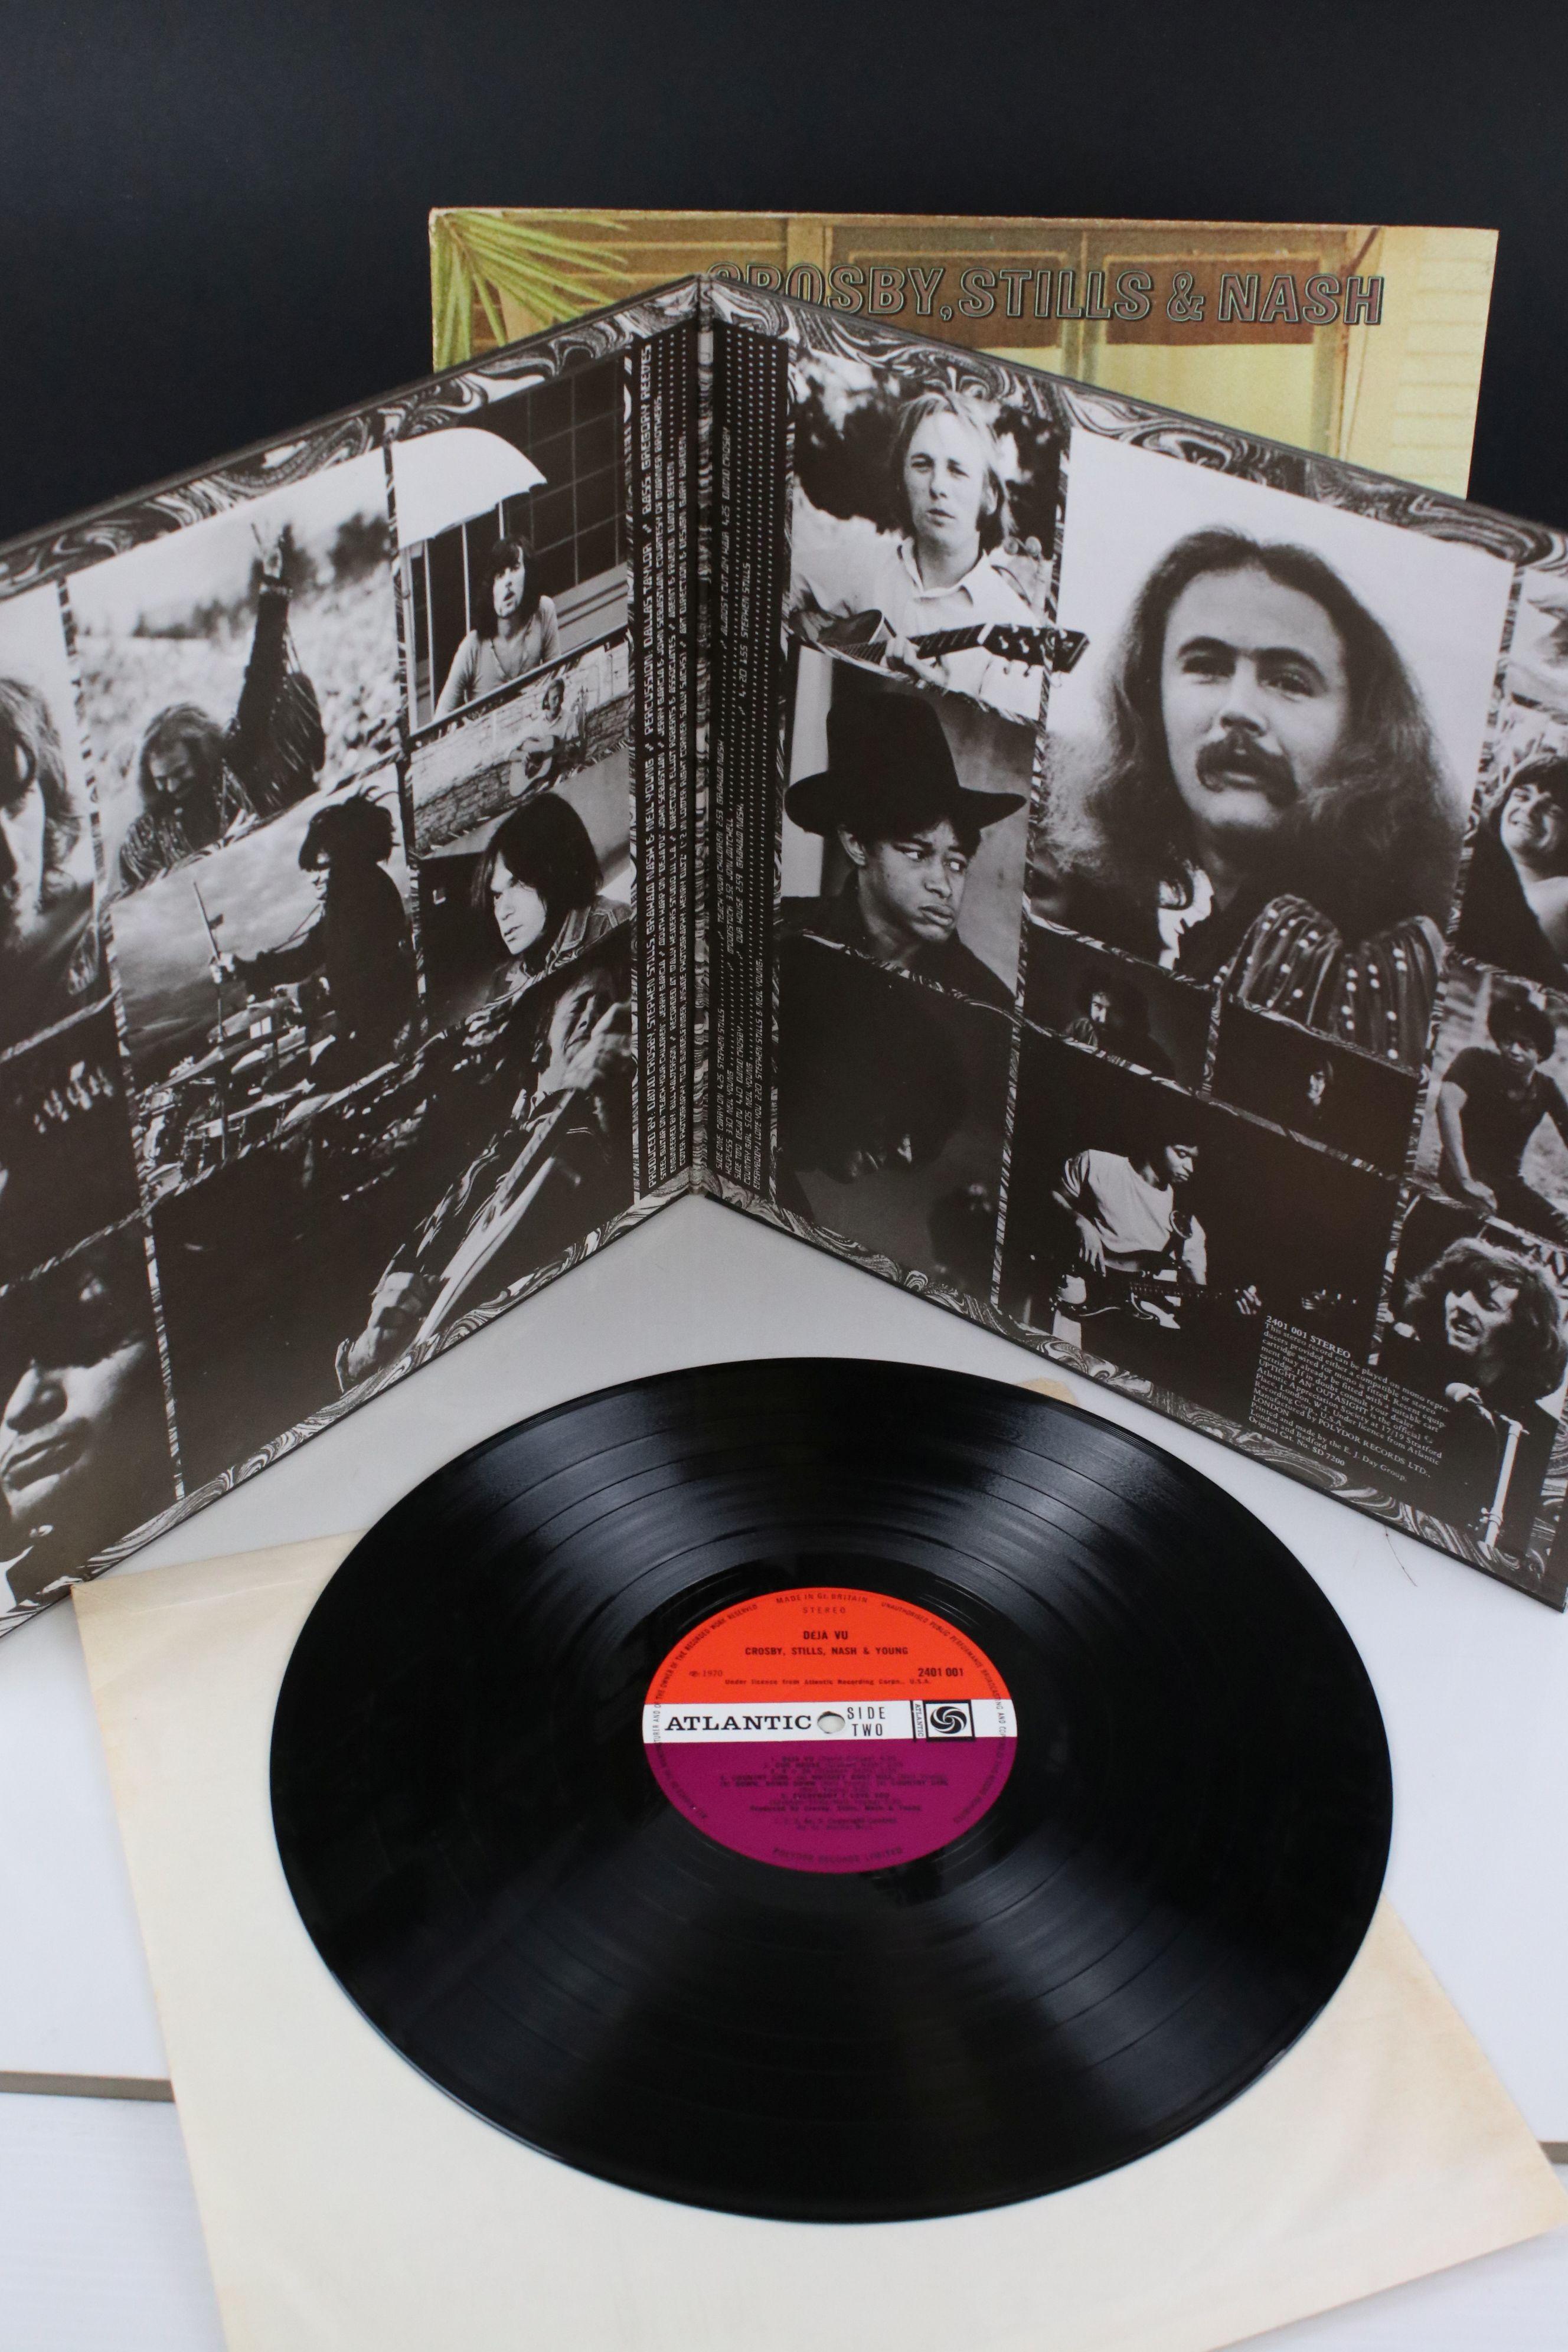 Vinyl - Crosby, Stills, Nash & Young Deja Vu (Atlantic 2401 001) red and plum Atlantic label with - Image 2 of 4